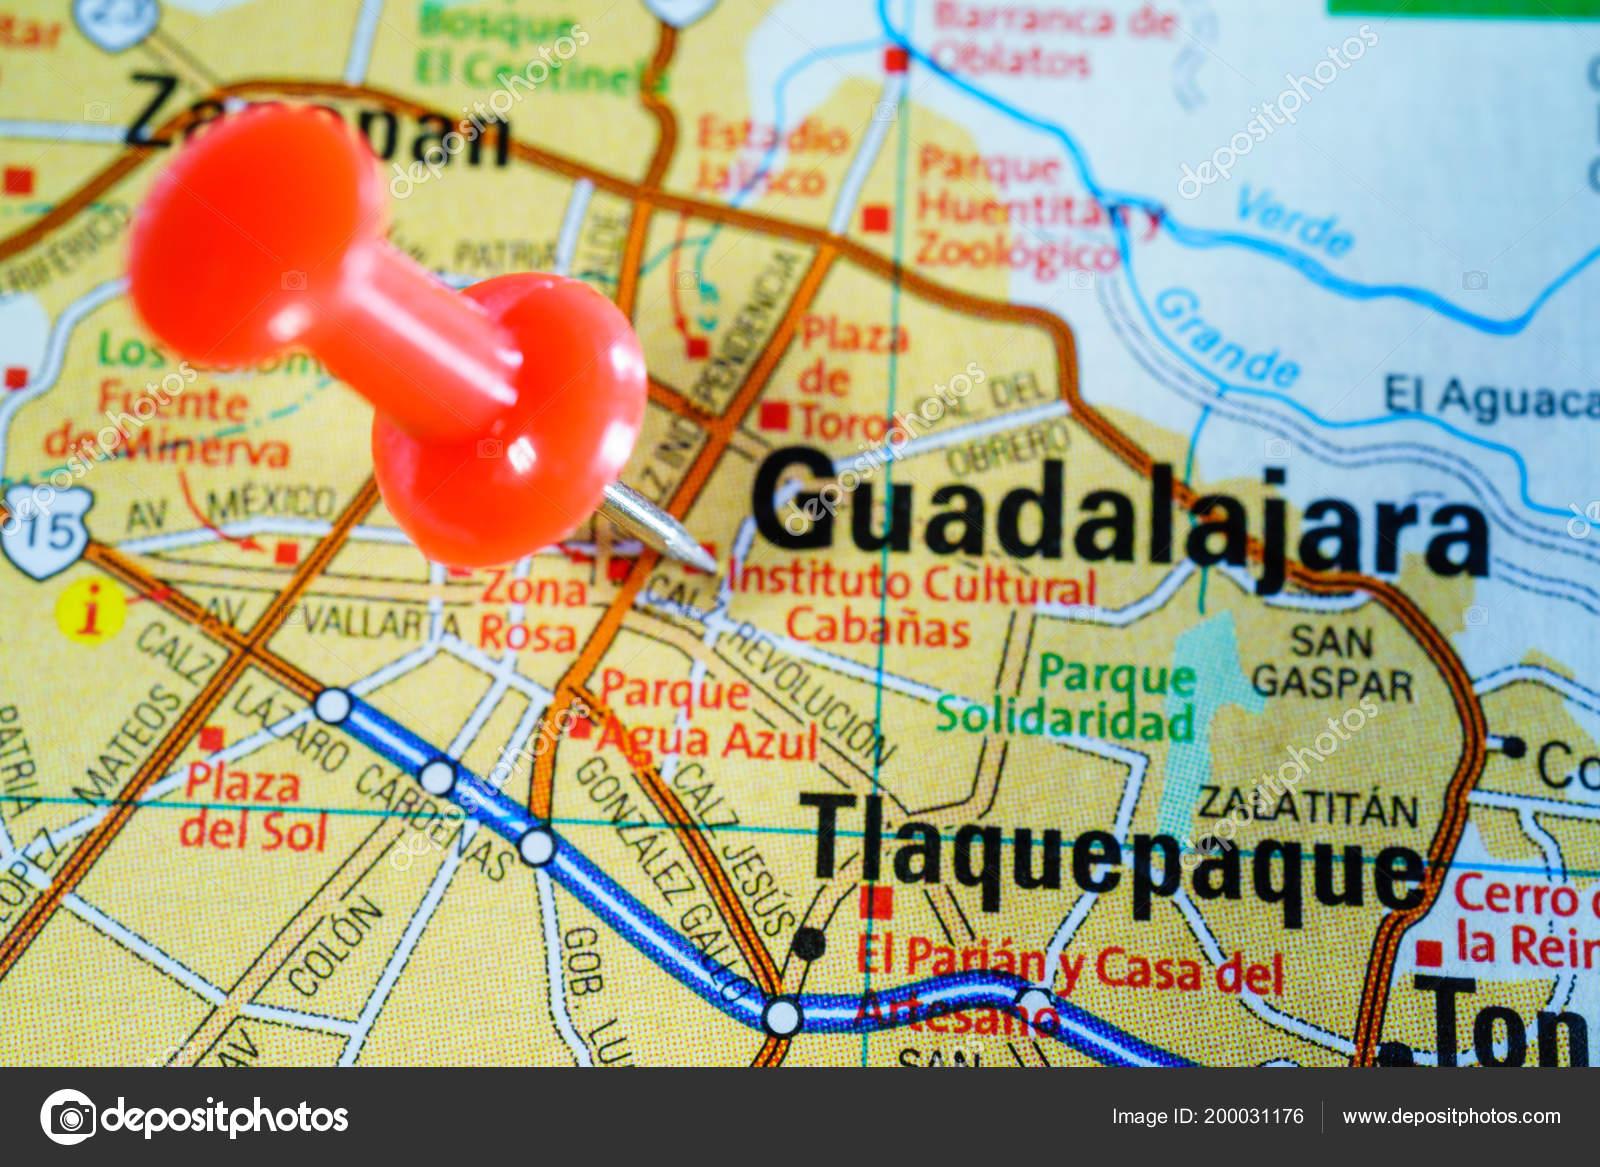 Guadalajara Mexico Mapa Foto De Stock C Aallm 200031176